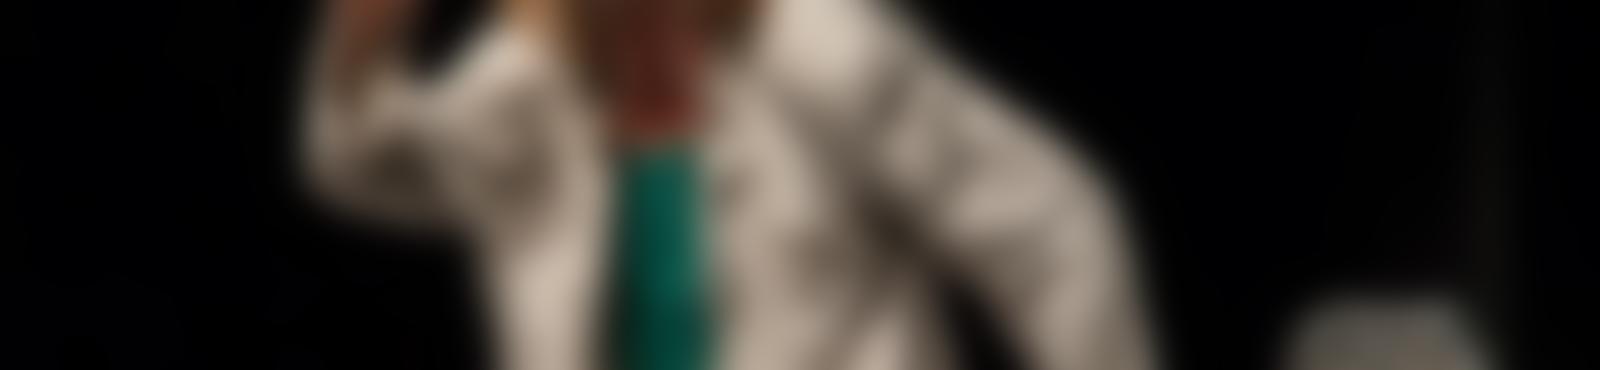 Blurred acce4d43 e0a8 4e2b 8973 8da63c50ed96